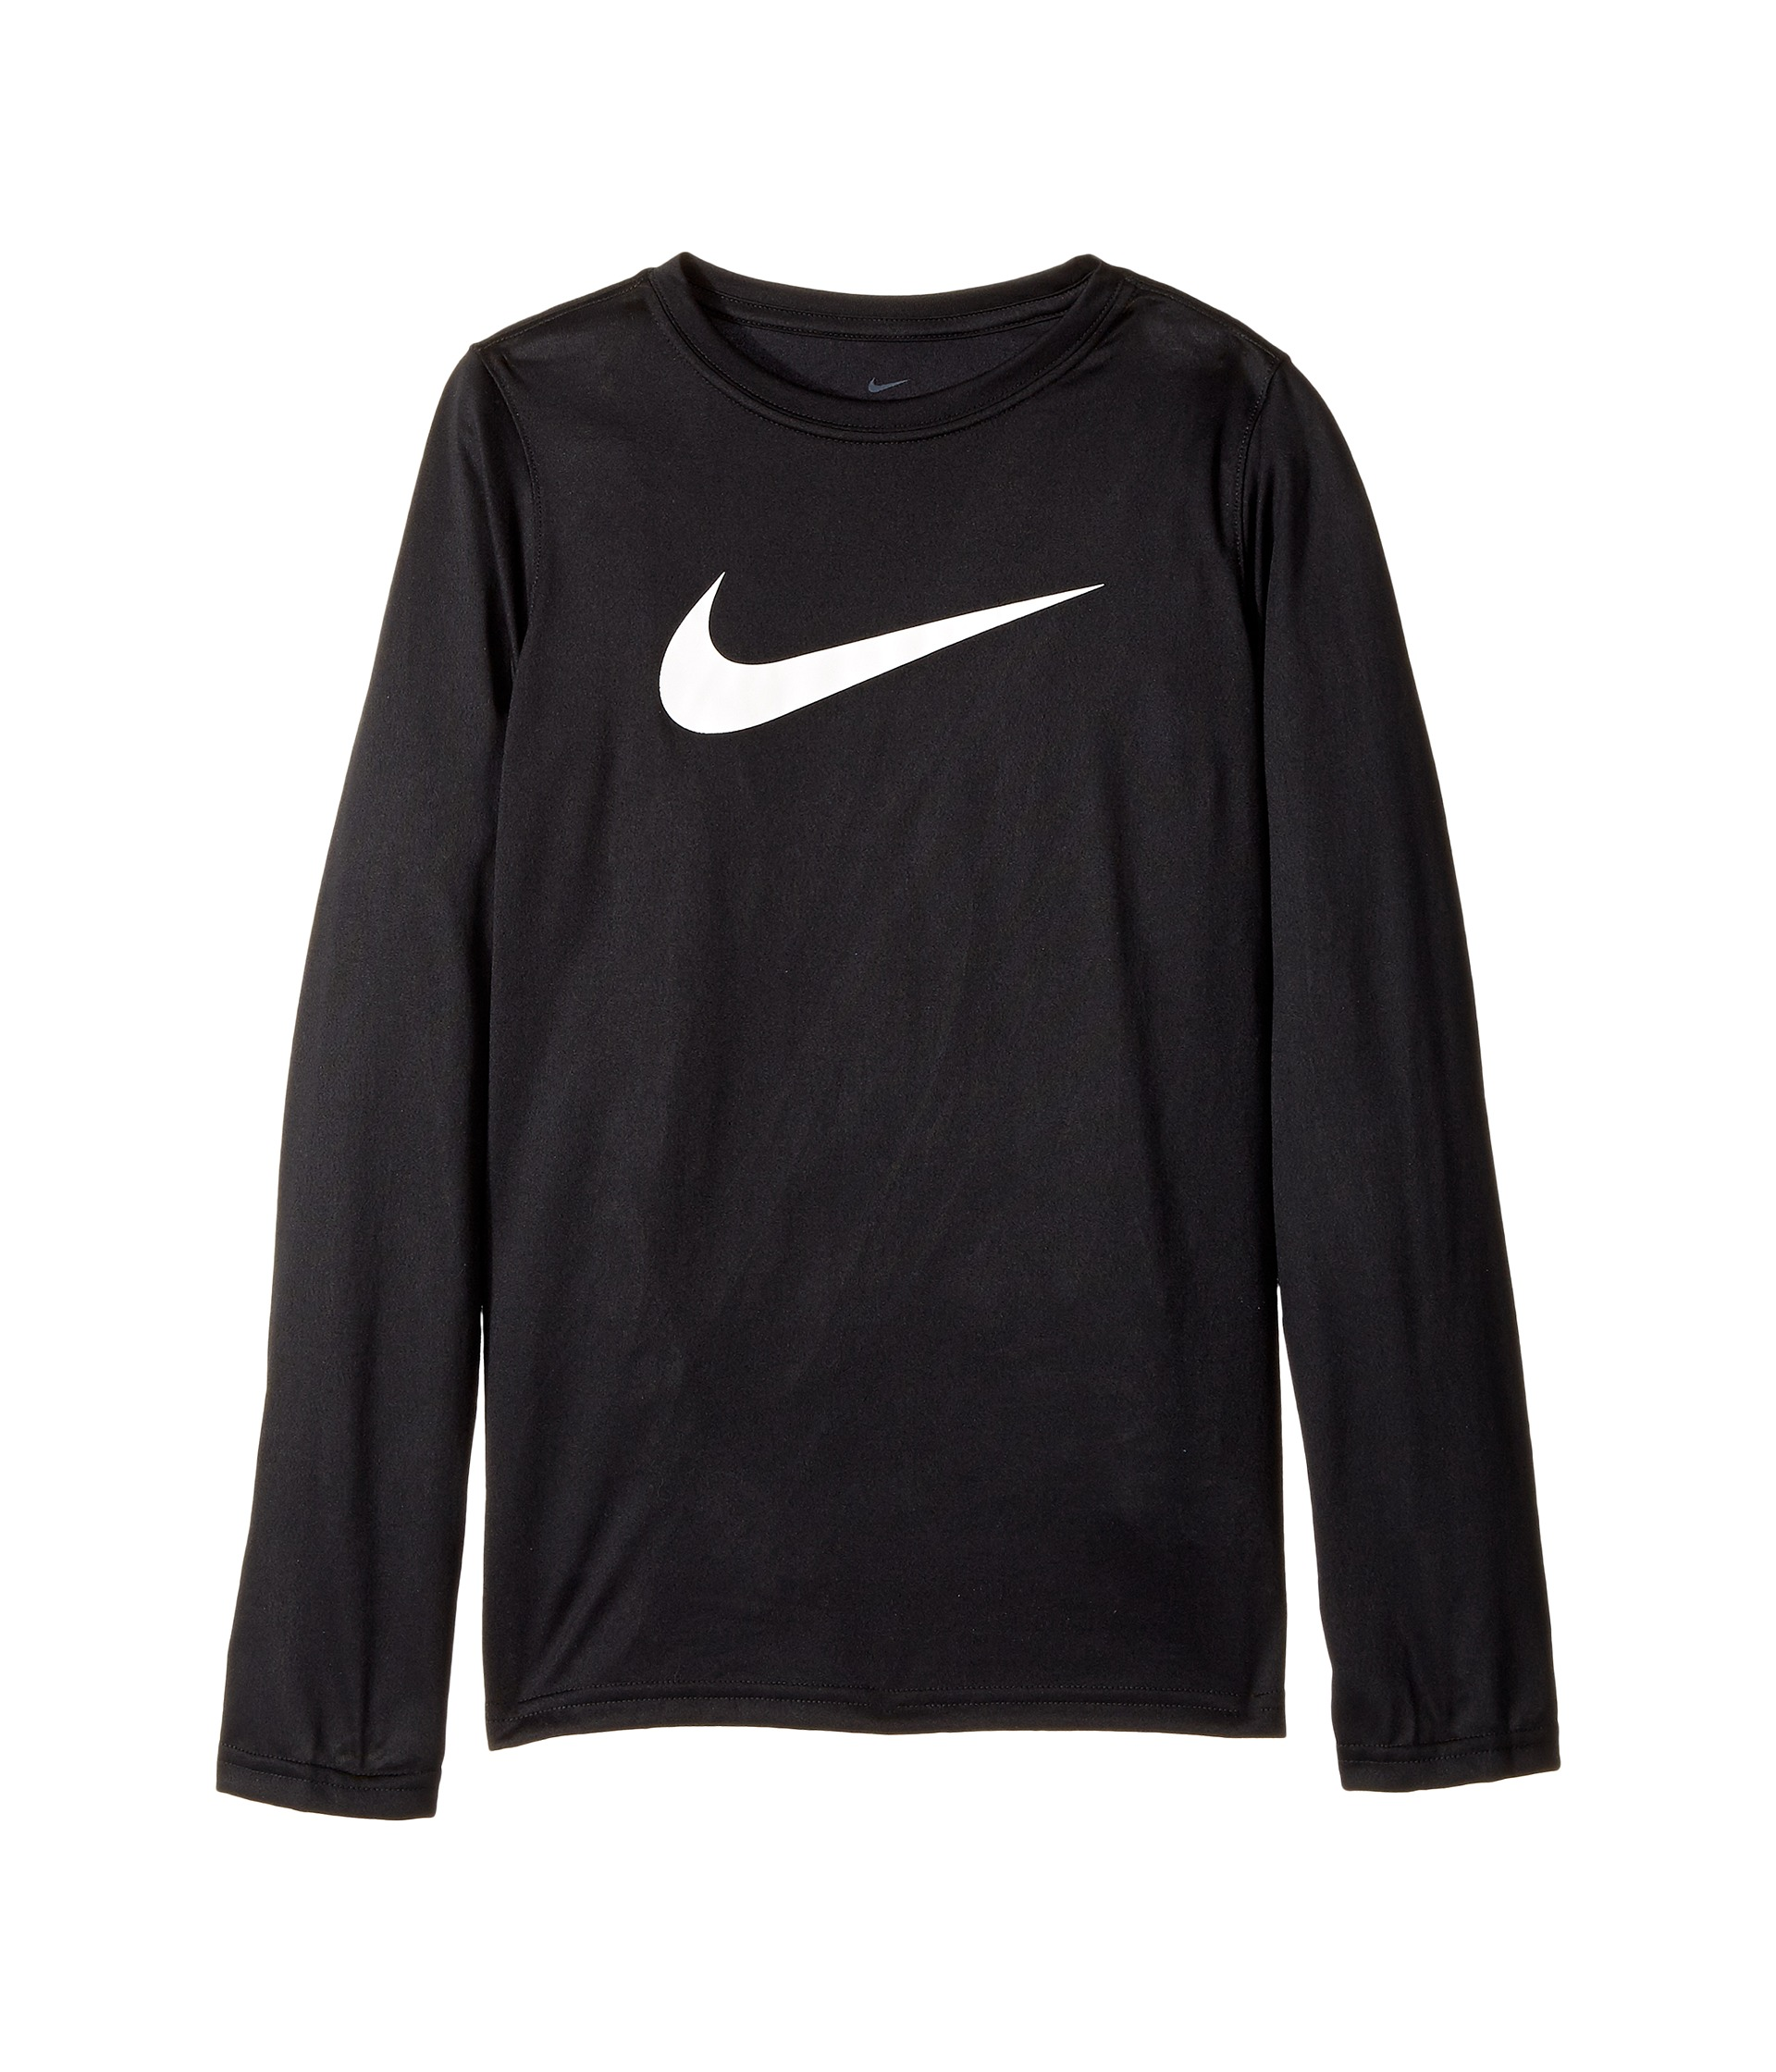 Nike Kids Dry Long Sleeve Training T Shirt Little Kids